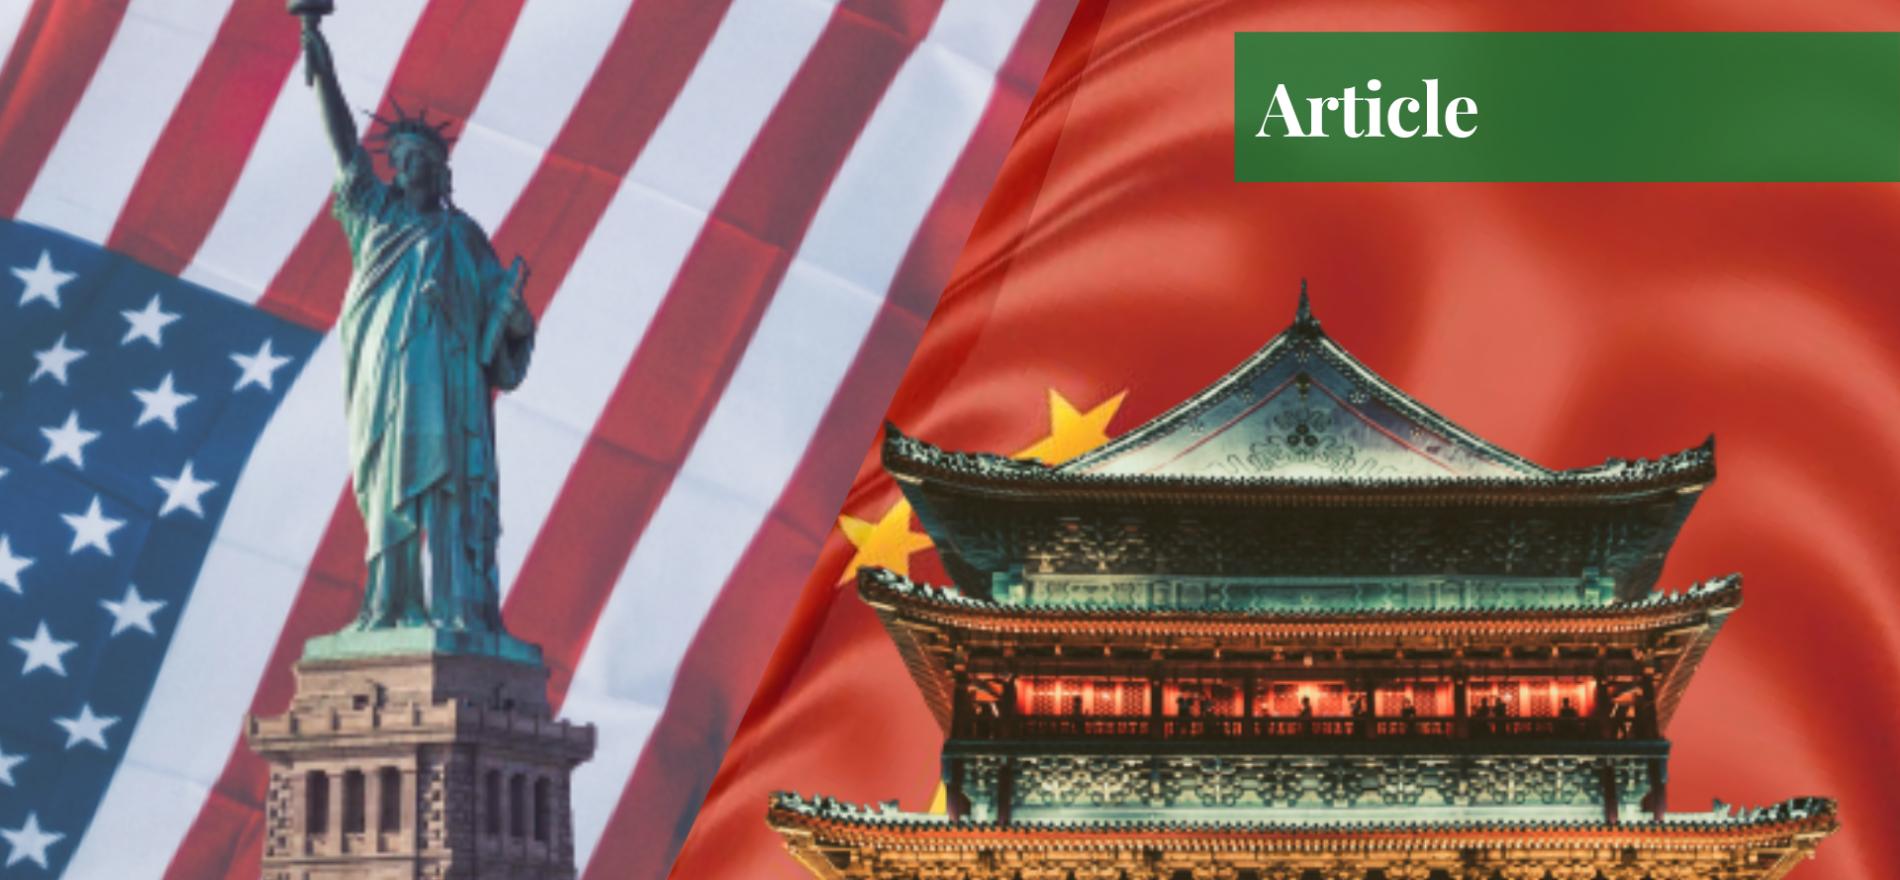 war between china and the us